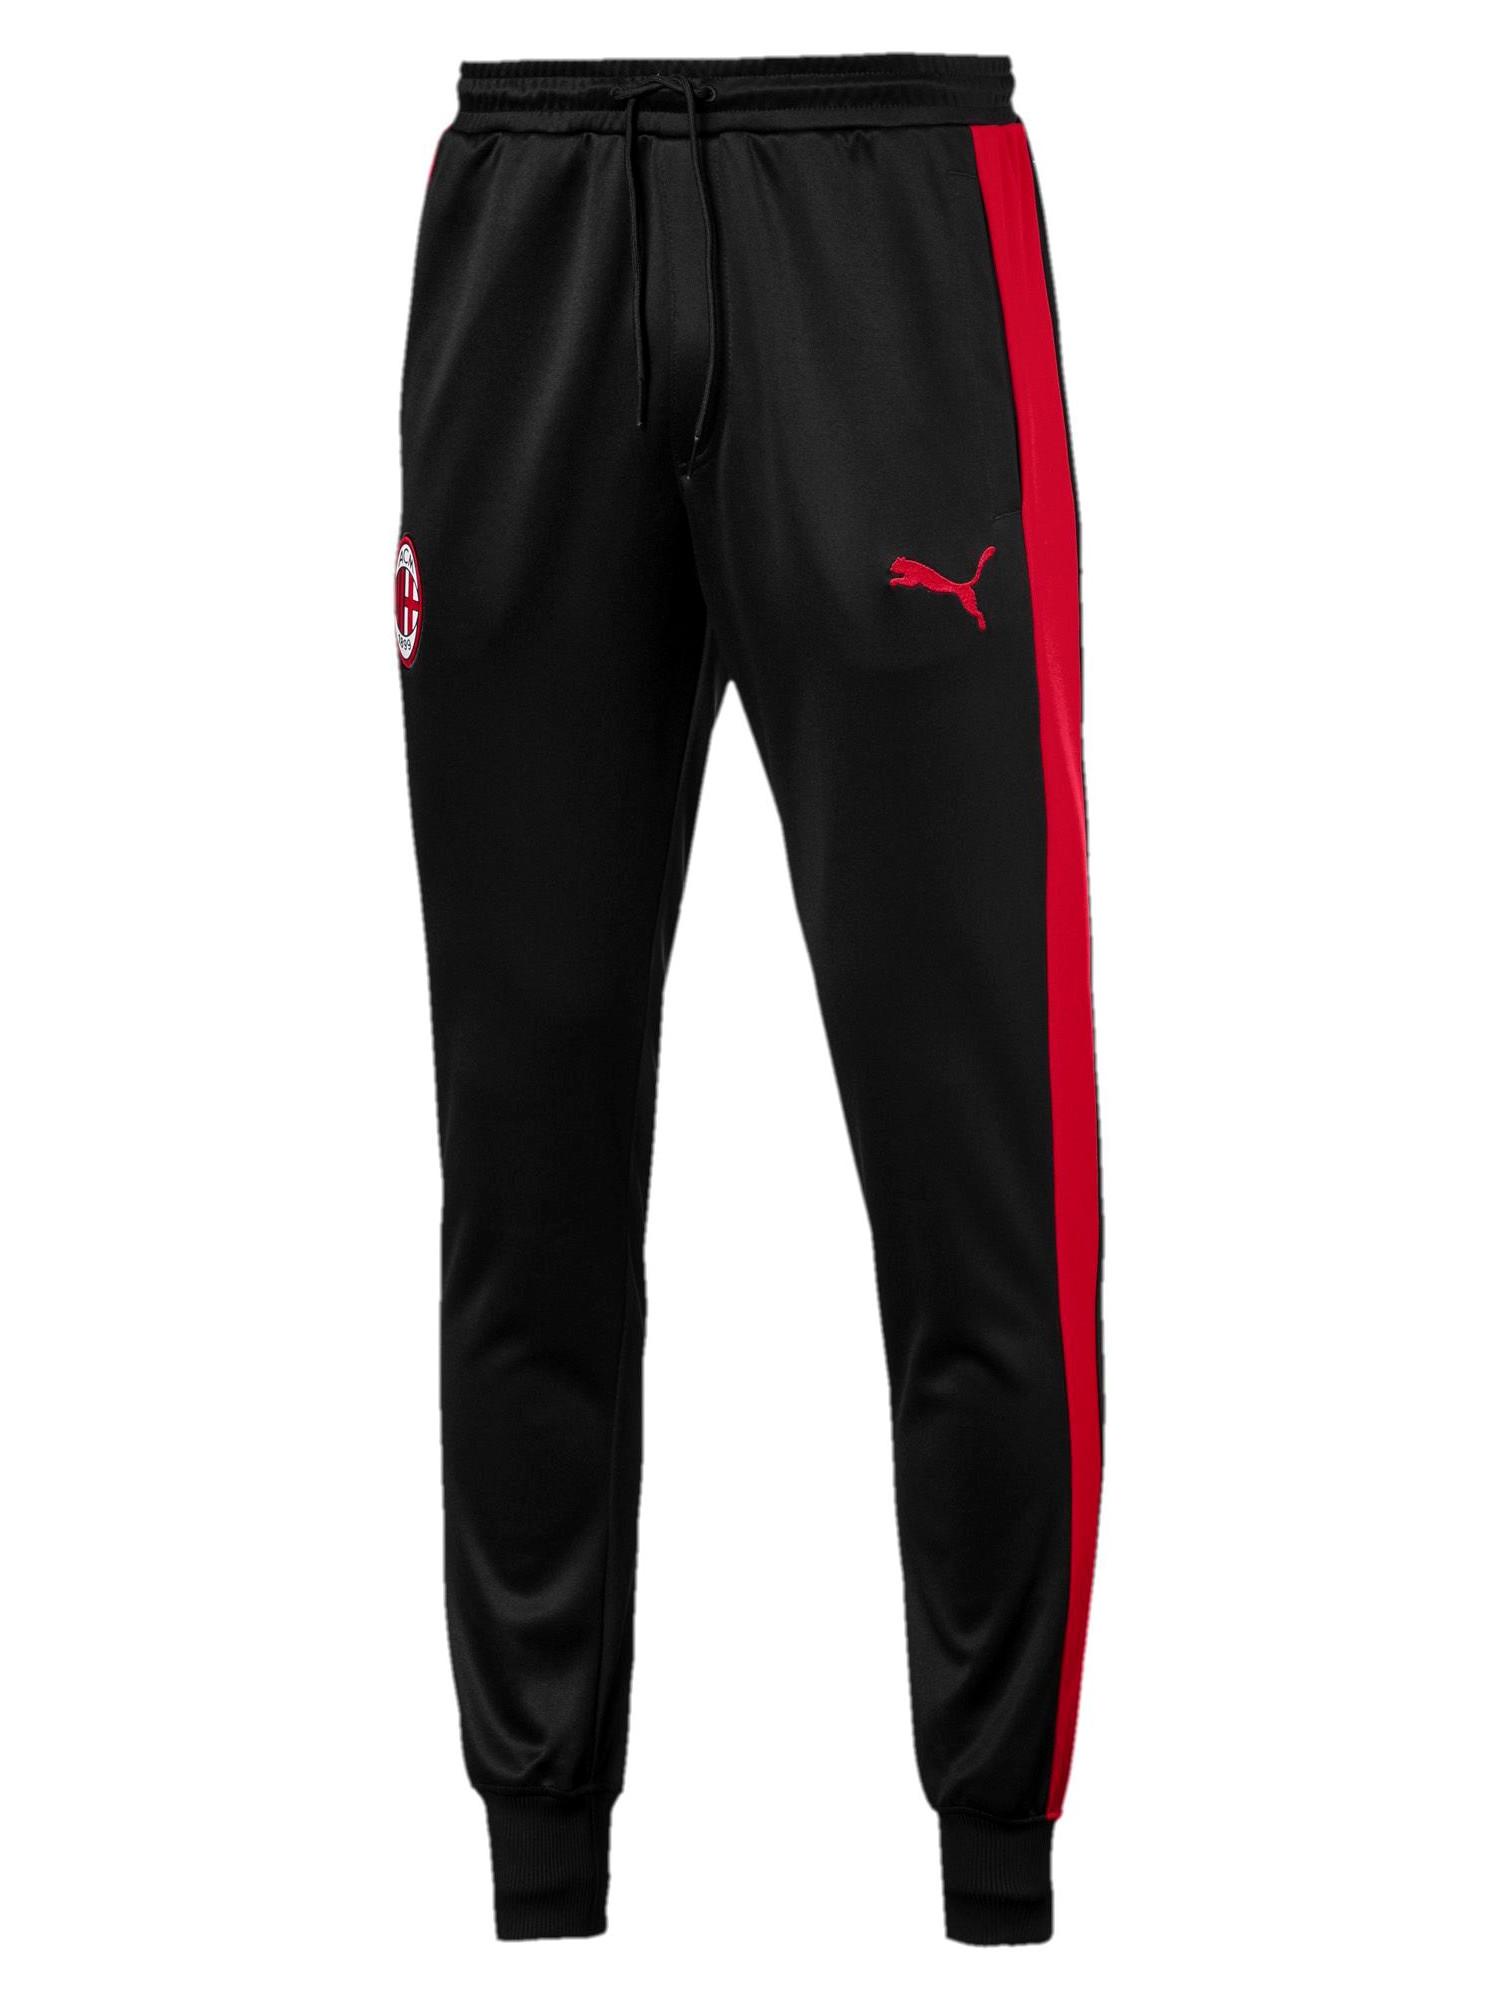 Pantalon Noir T7 Track Hose Milan Pants Puma Ac 19 Ebay 2018 tqwa6xUF